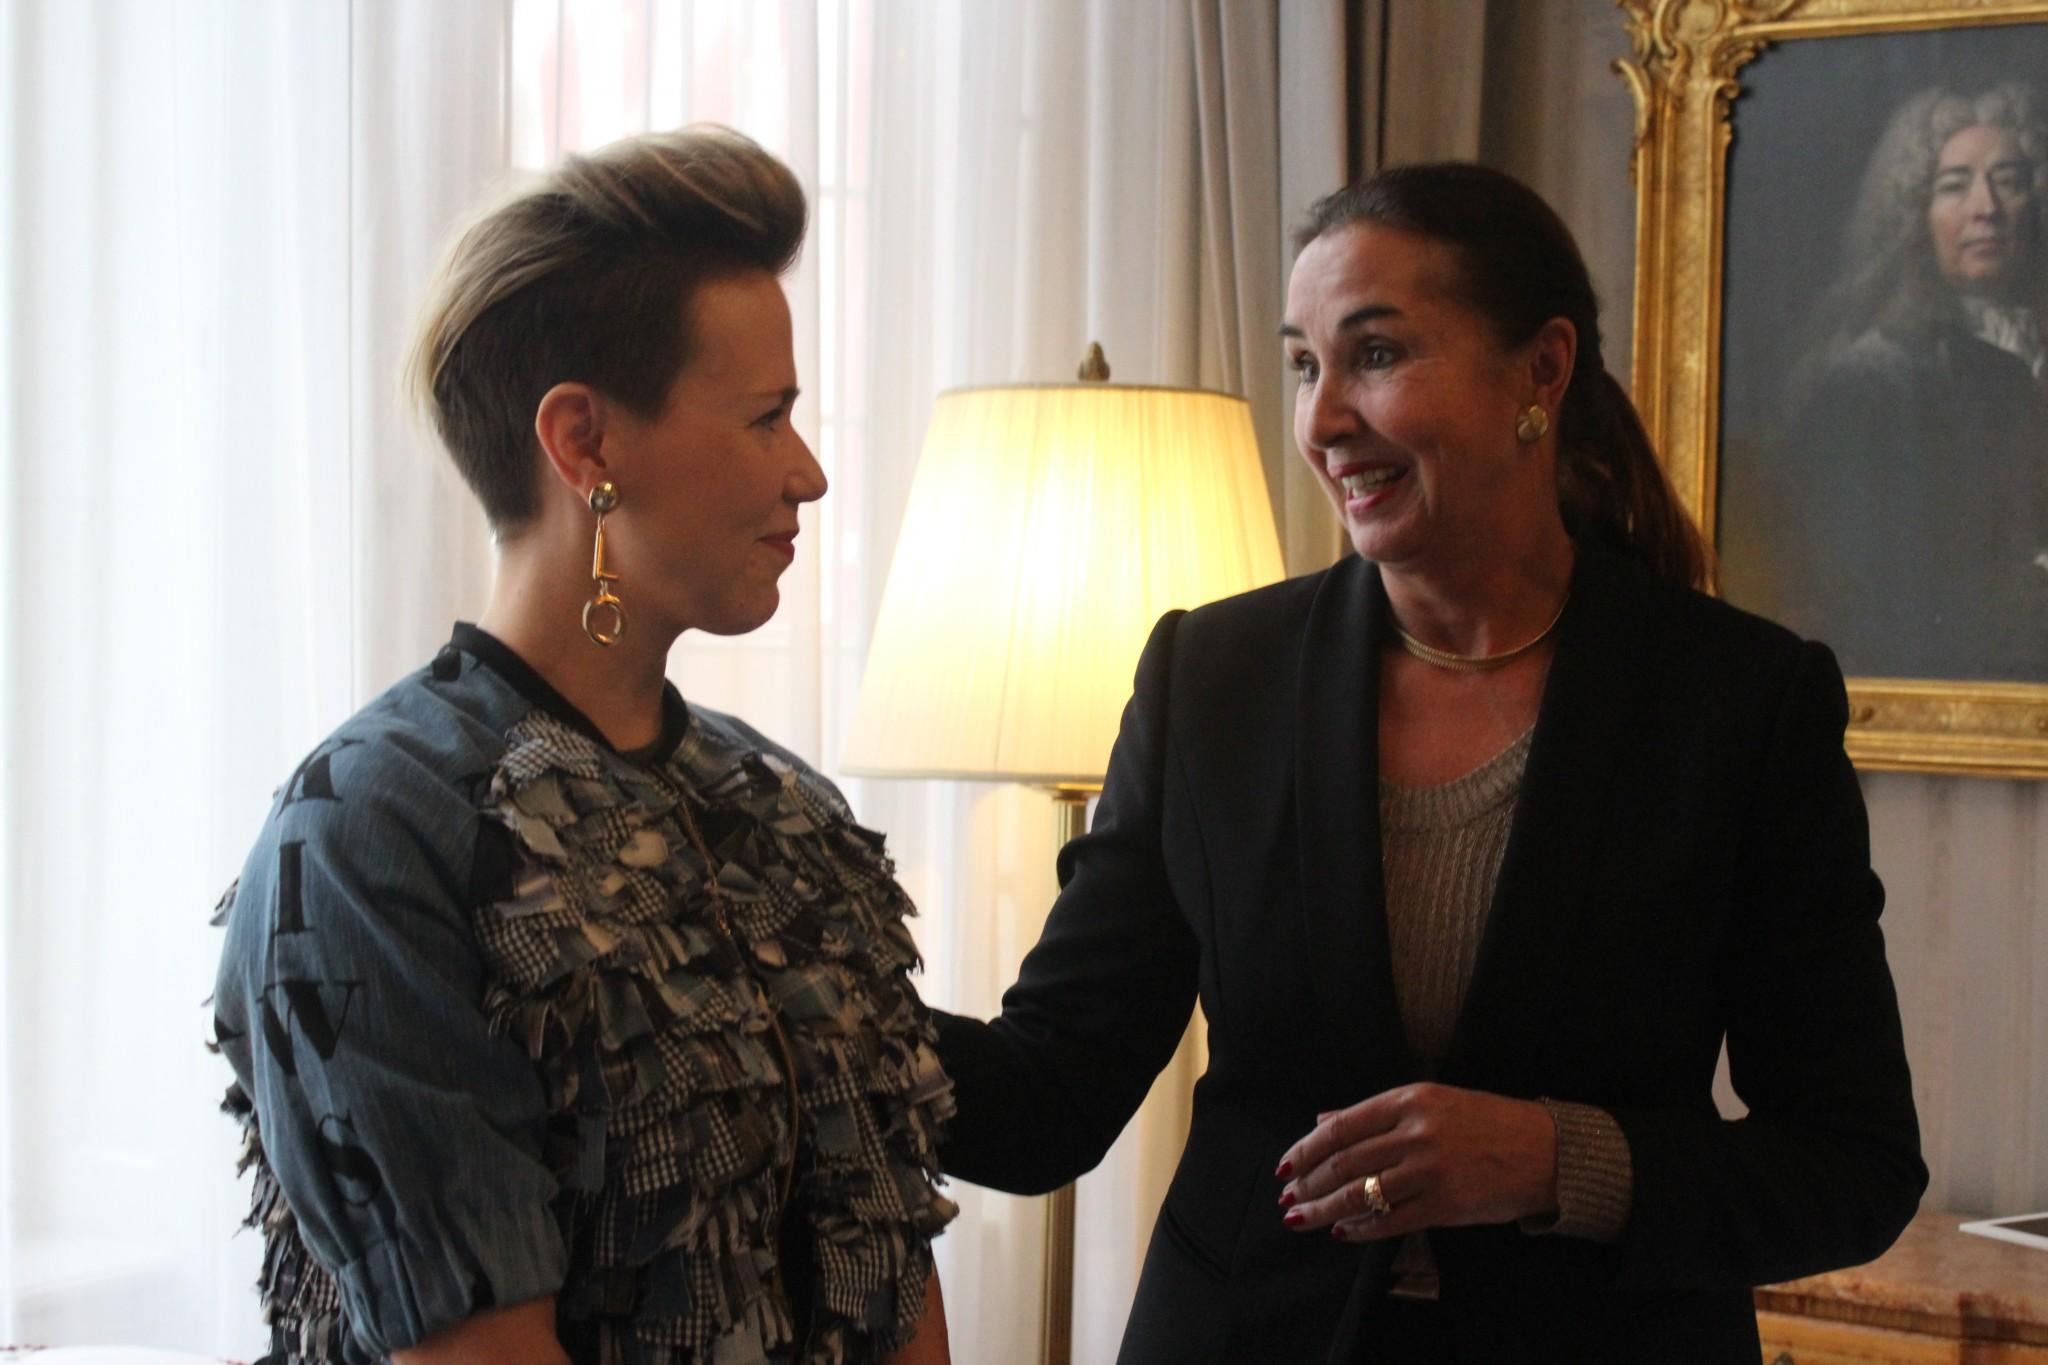 Raili Auraskari mit FRANKfurtstyleaward Gründerin Hannemie Stitz-Krämer